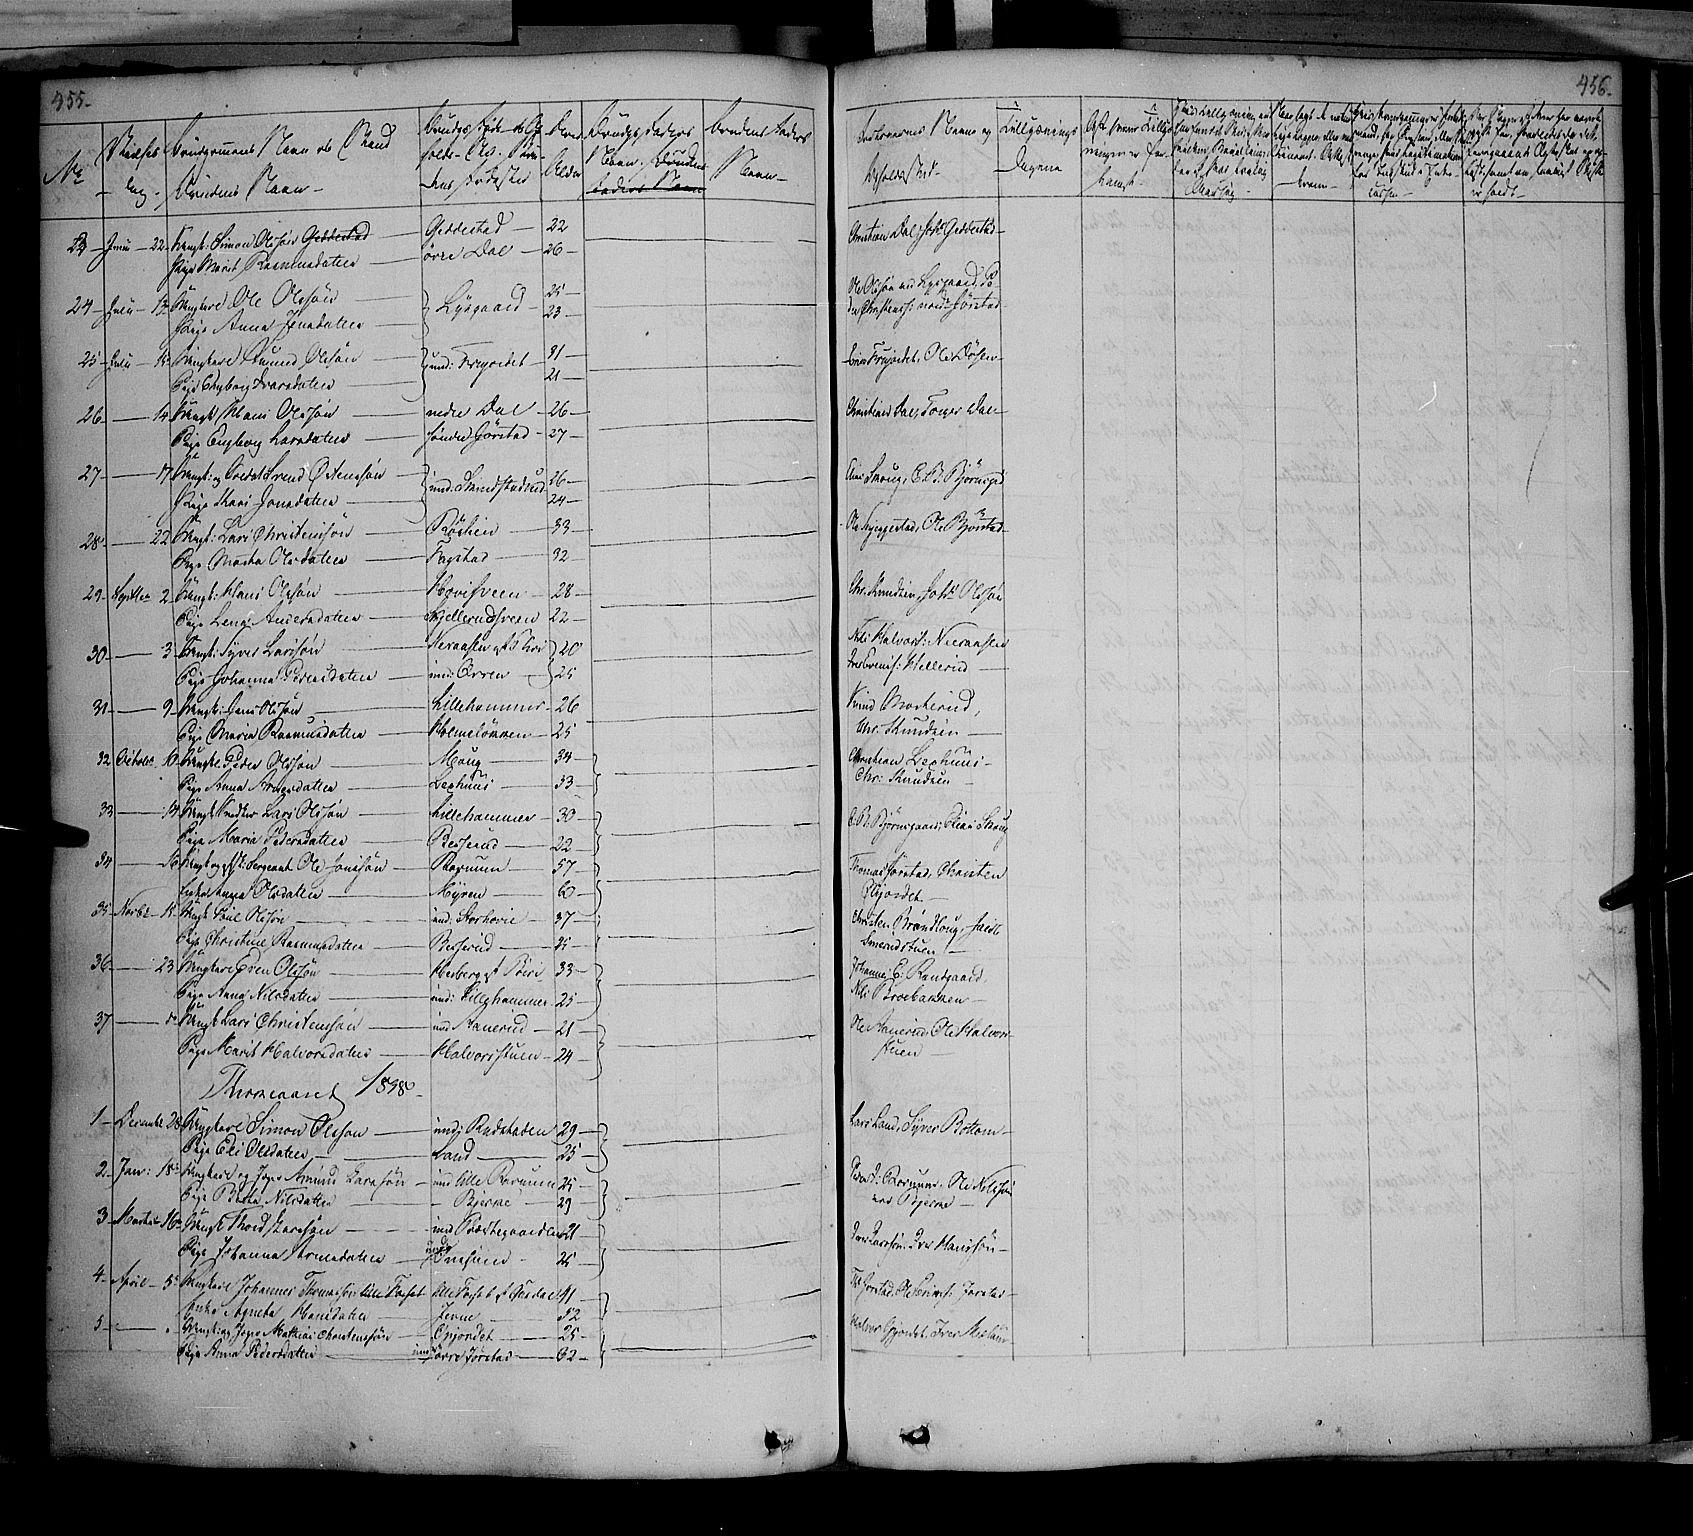 SAH, Fåberg prestekontor, Ministerialbok nr. 5, 1836-1854, s. 455-456